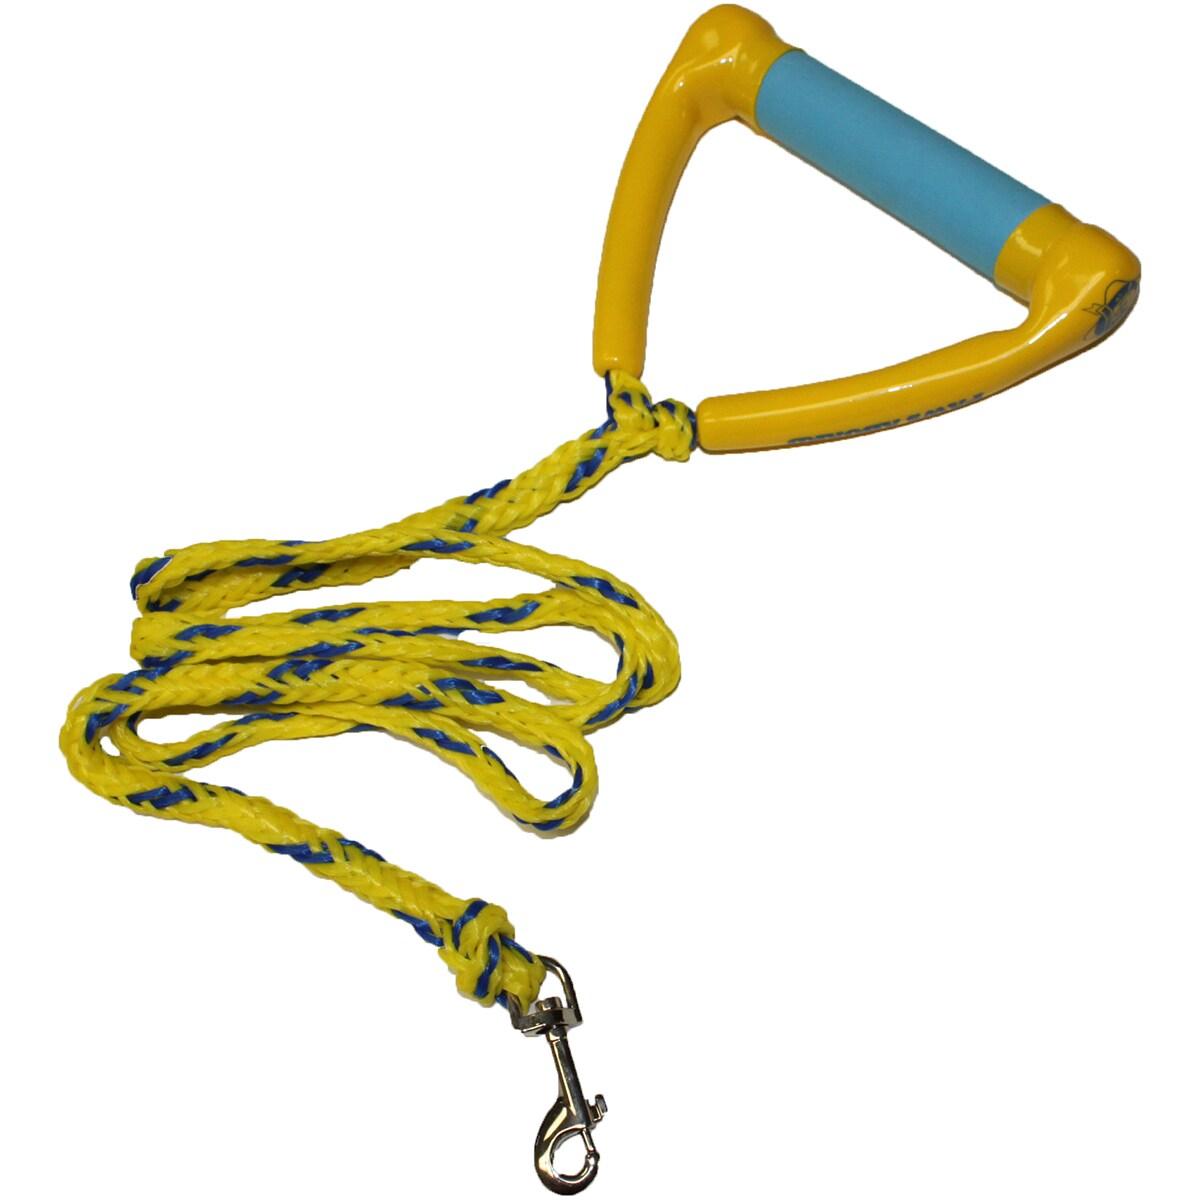 Novelty Ski Rope Leash 4.5' (4.5ft), Yellow, Size M